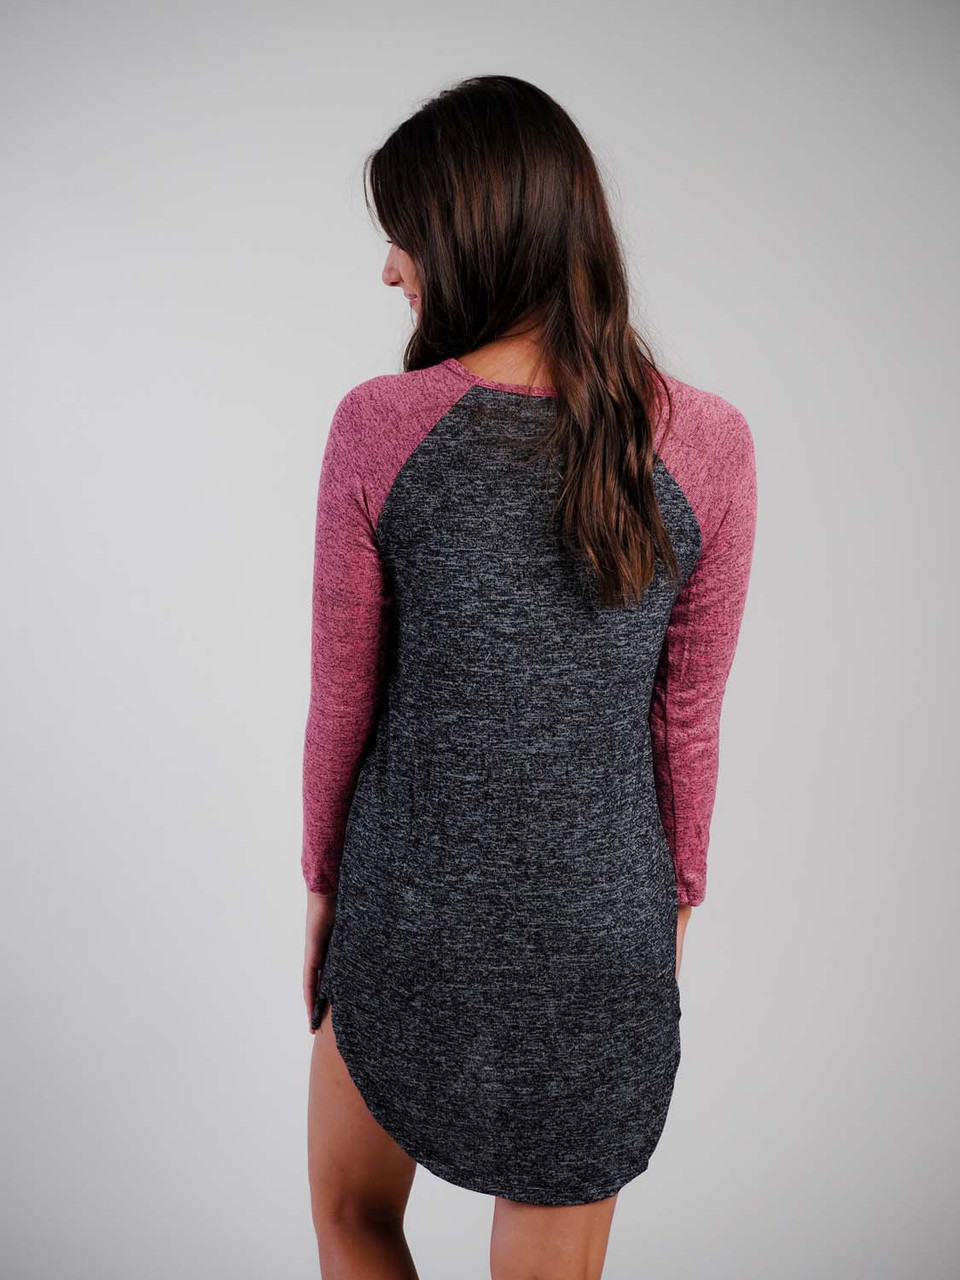 black pink sleep shirt